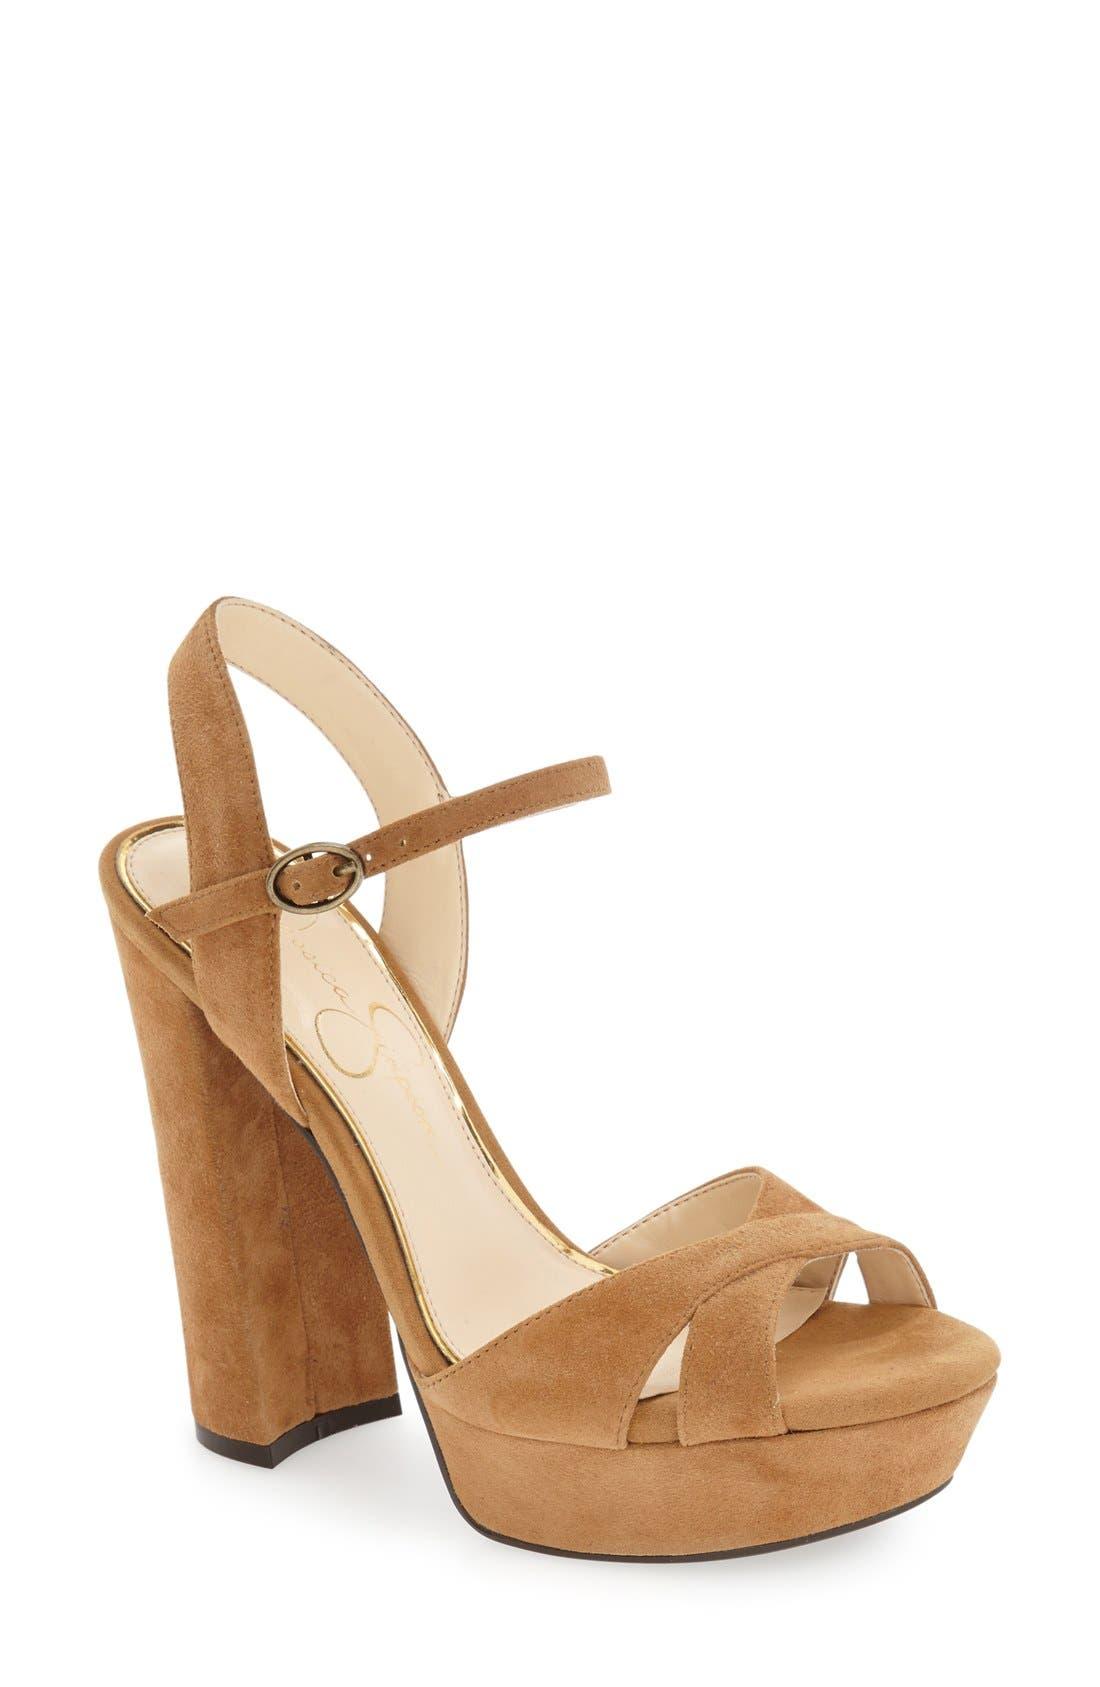 Alternate Image 1 Selected - Jessica Simpson 'Naidine' Platform Sandal (Women)